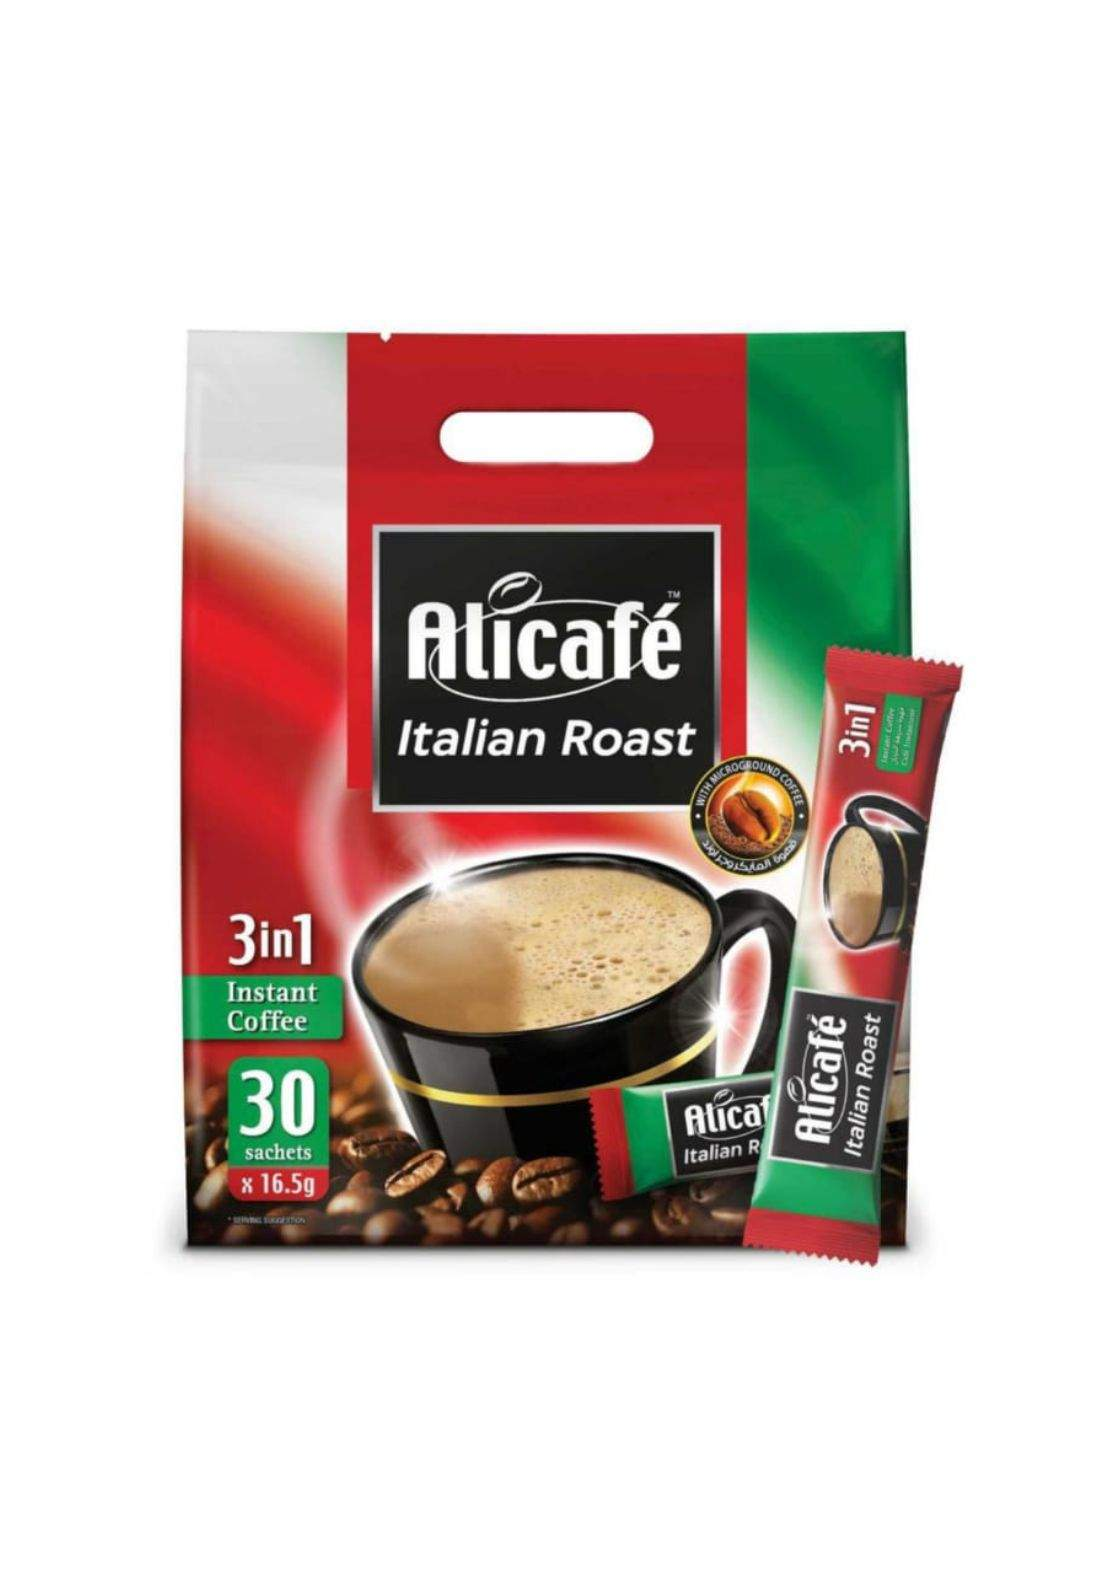 Alicafe Instant Coffee 30 قهوة علي كافية سريعة الذوبان ظرف